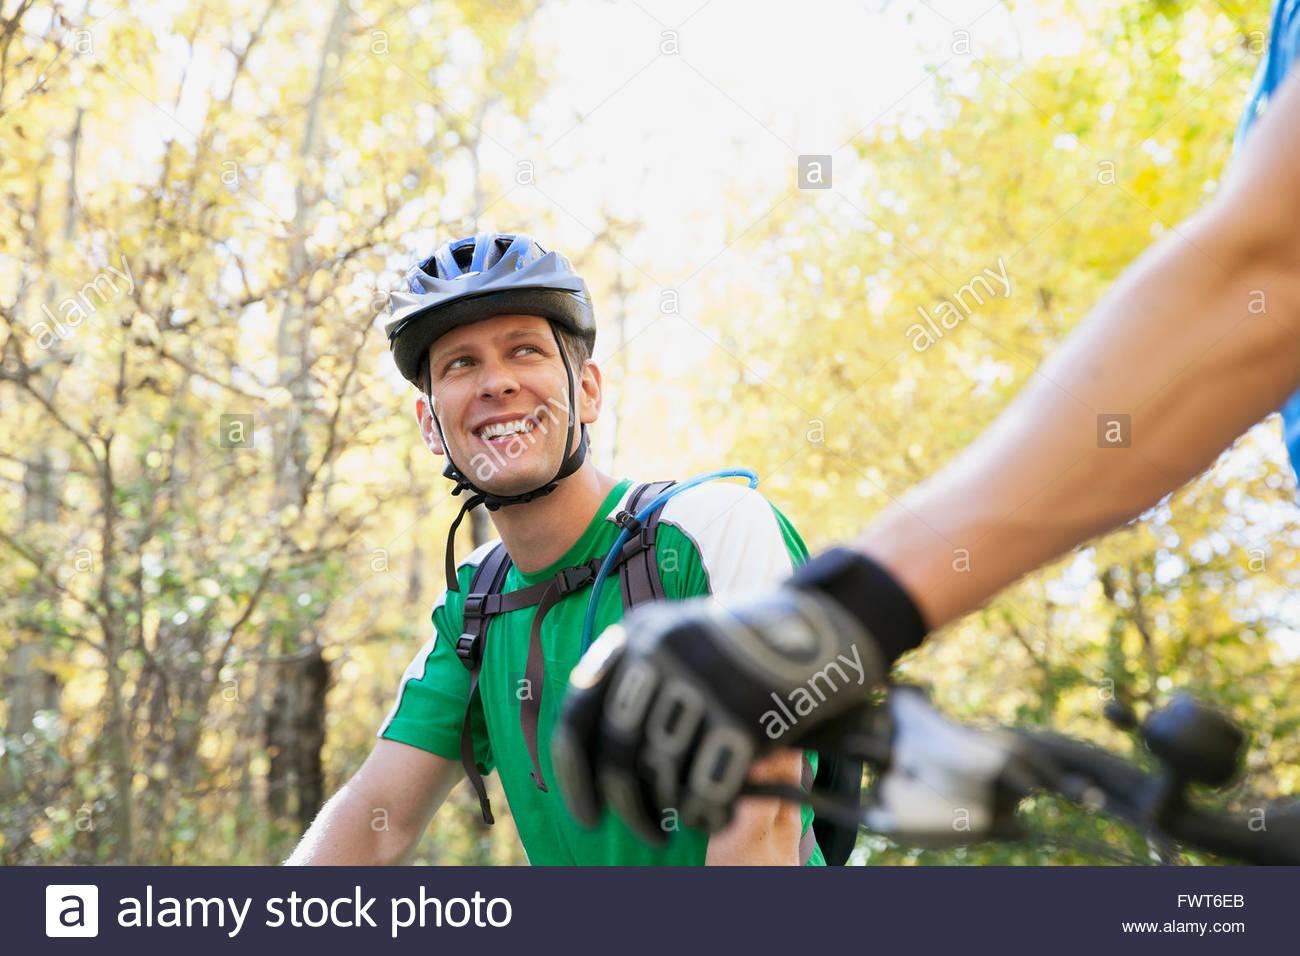 Mann drehen um Bike Partner betrachten. Stockbild